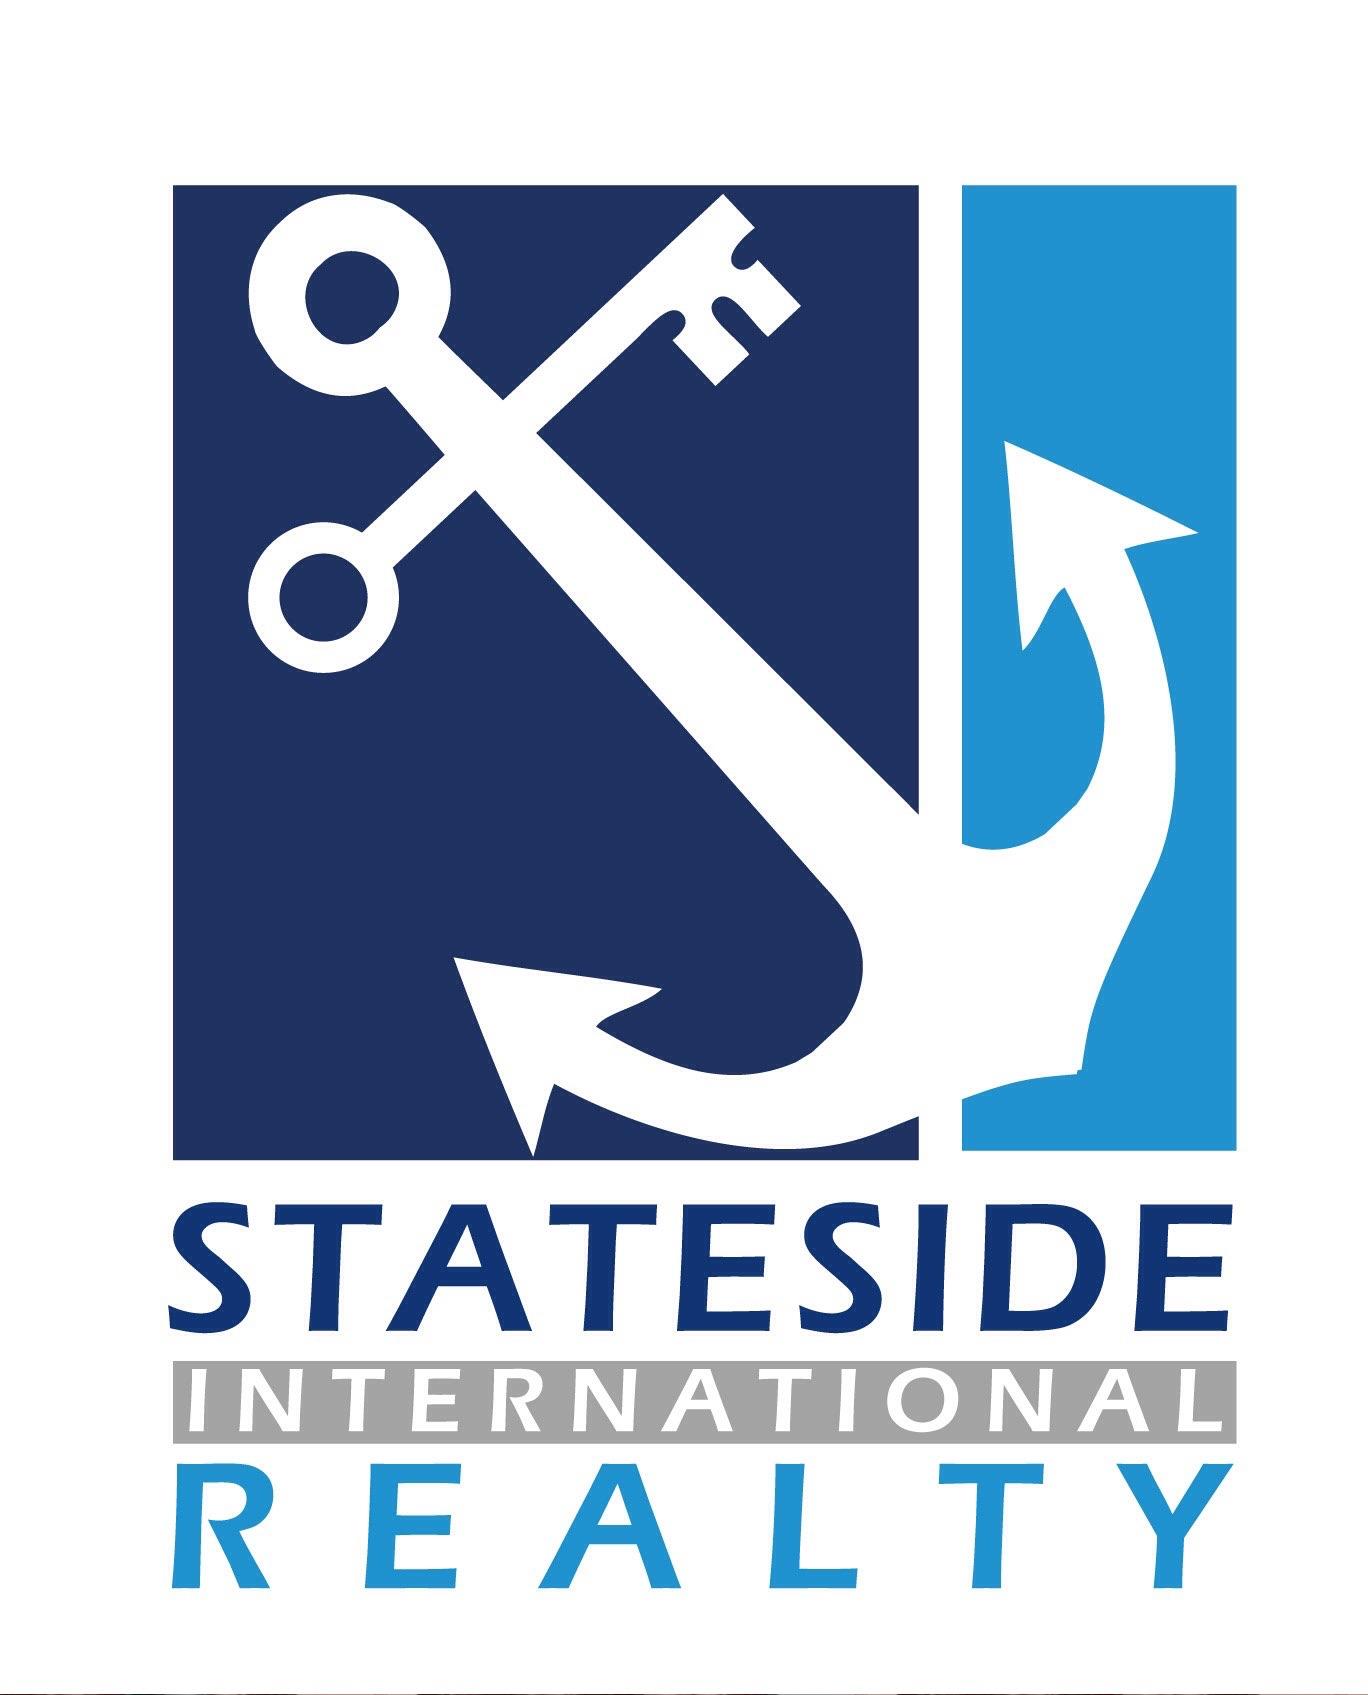 Stateside International Realty